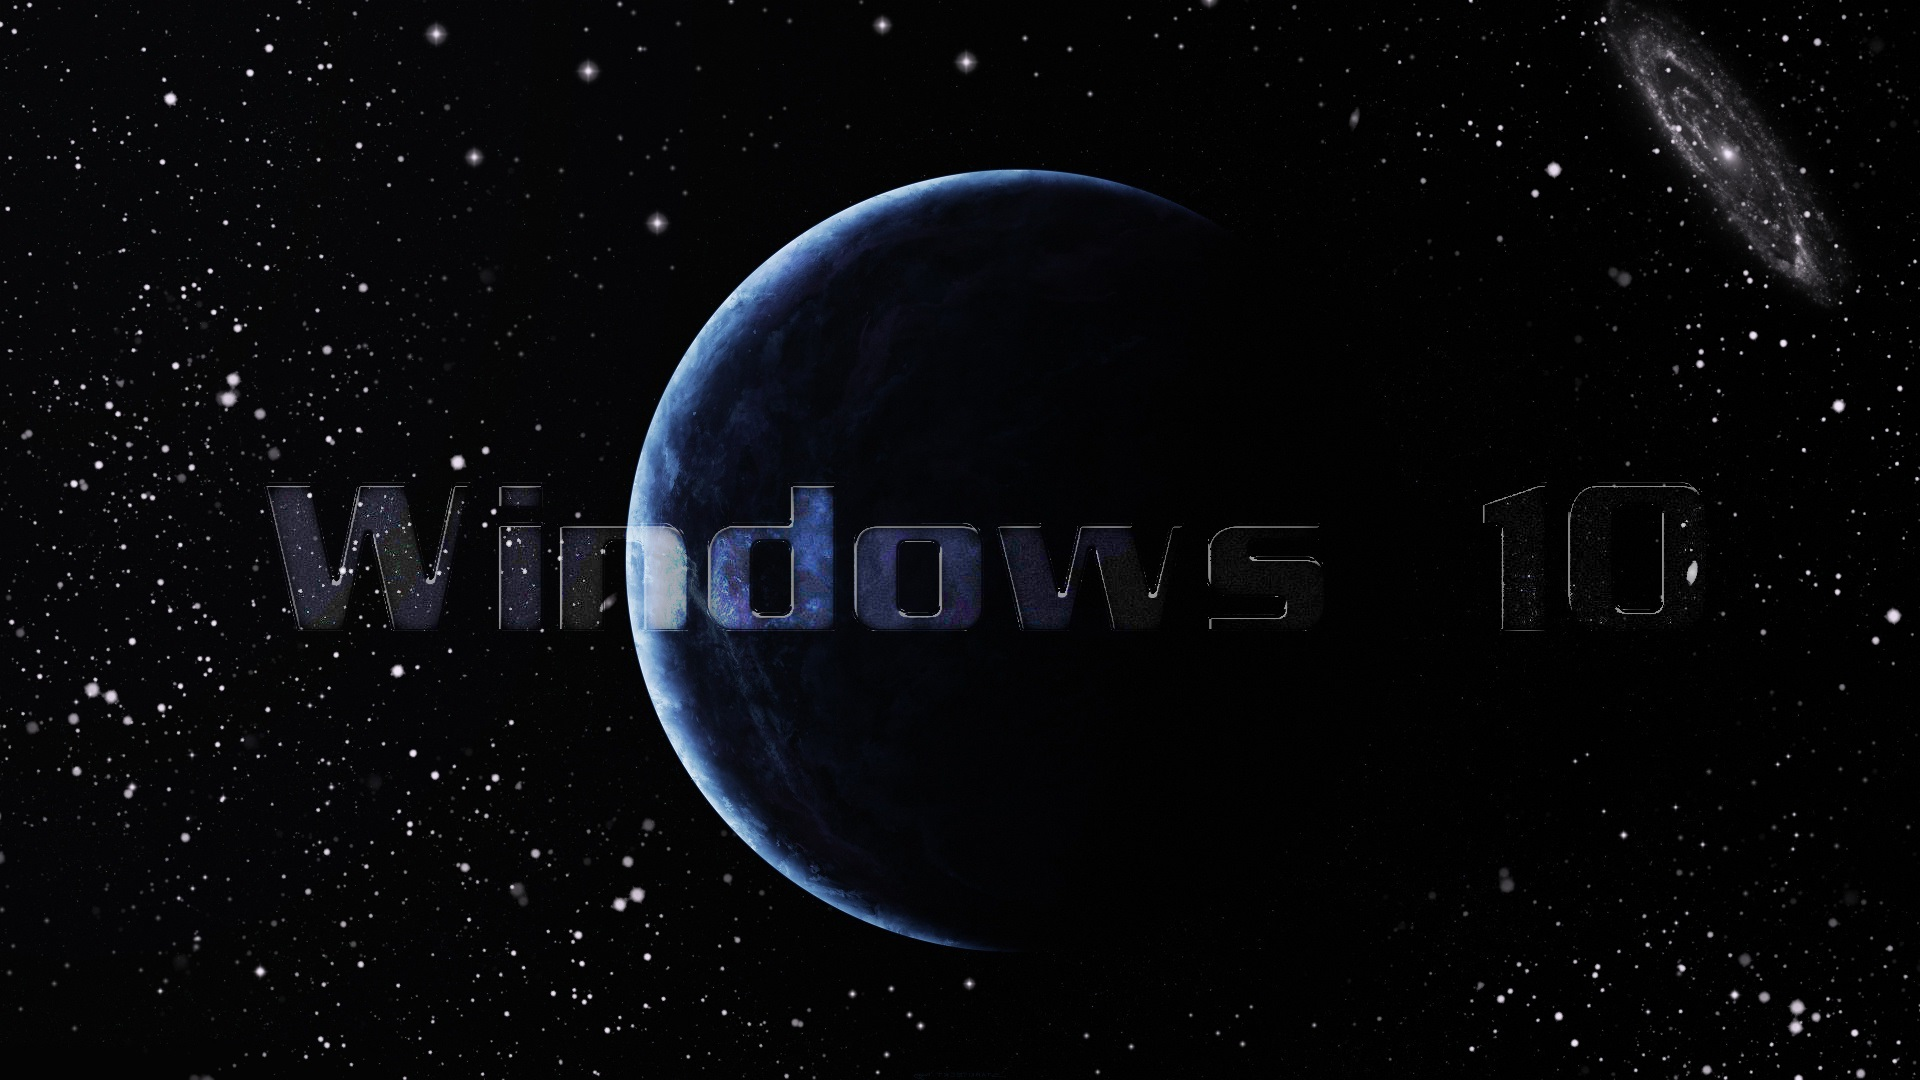 Windows 10 On Galaxy Wallpaper HD 9511 Wallpaper High Resolution 1920x1080